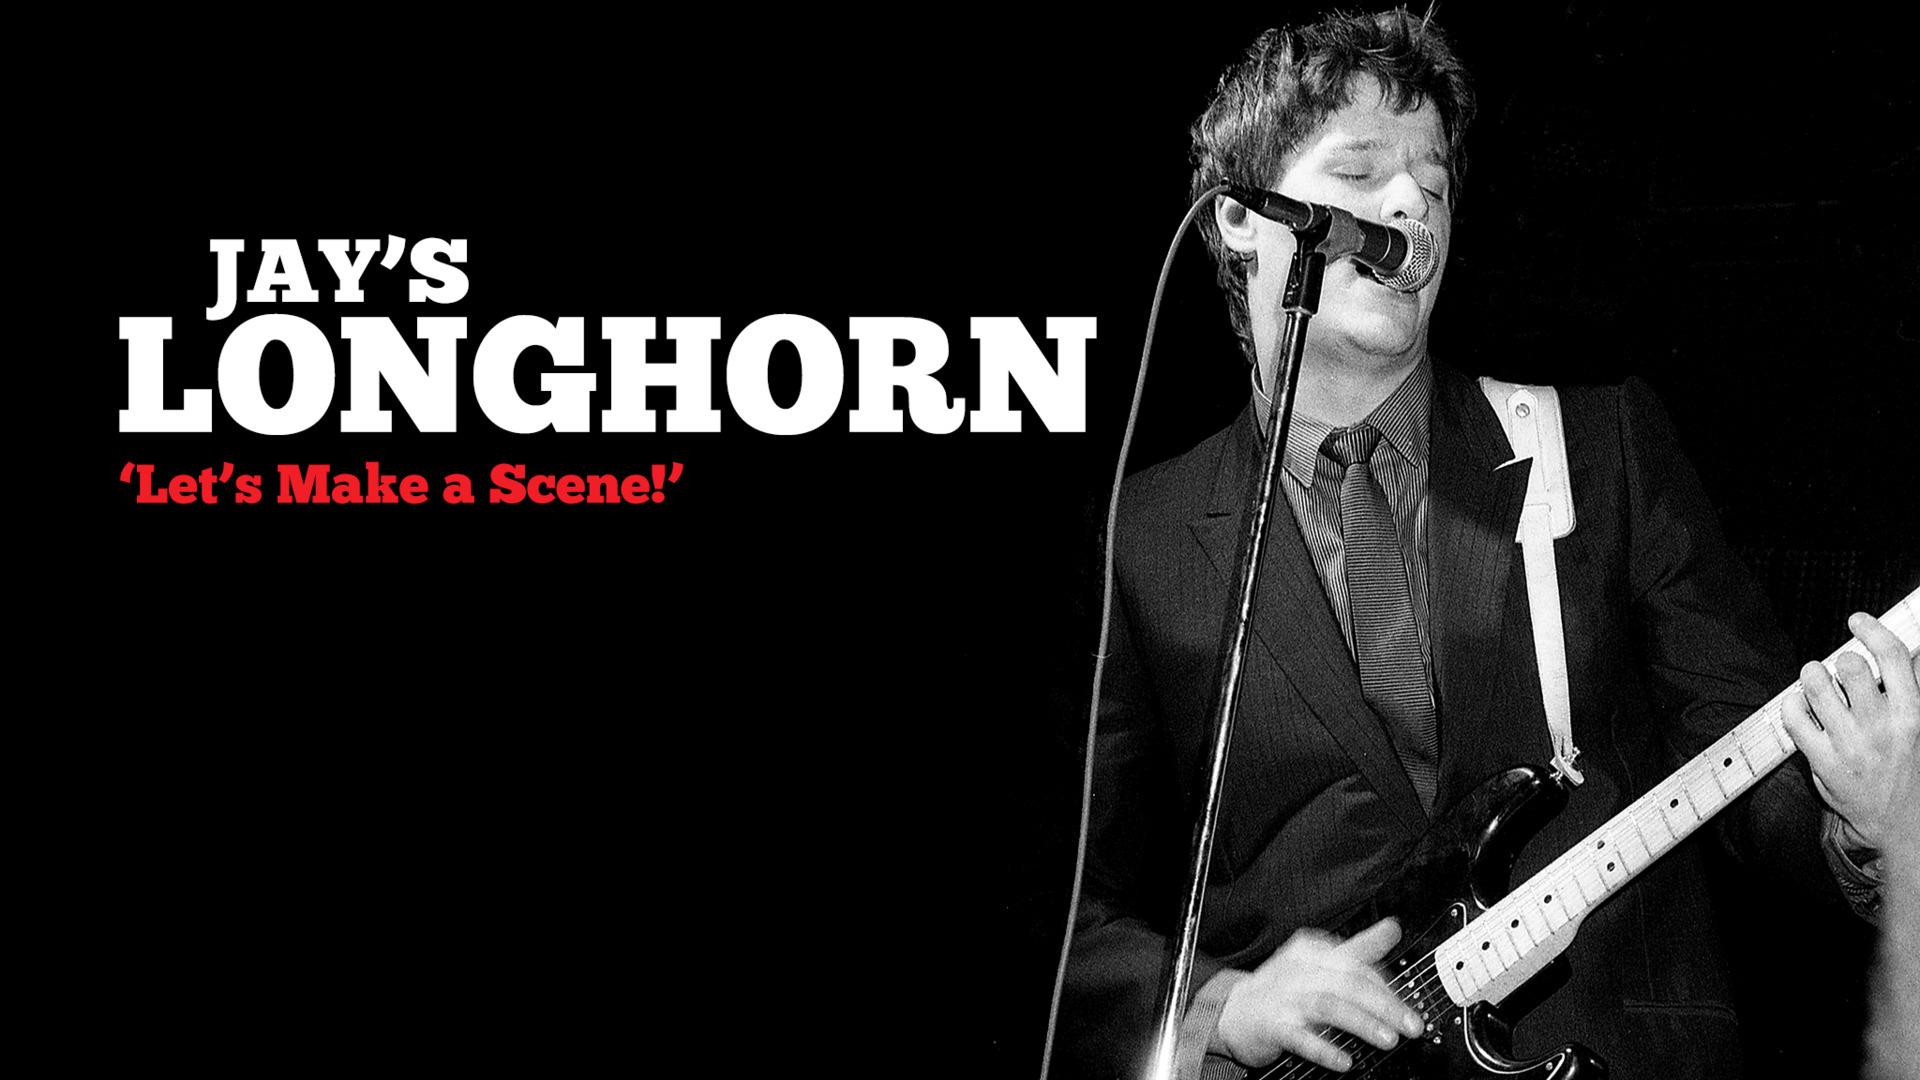 Jay's Longhorn